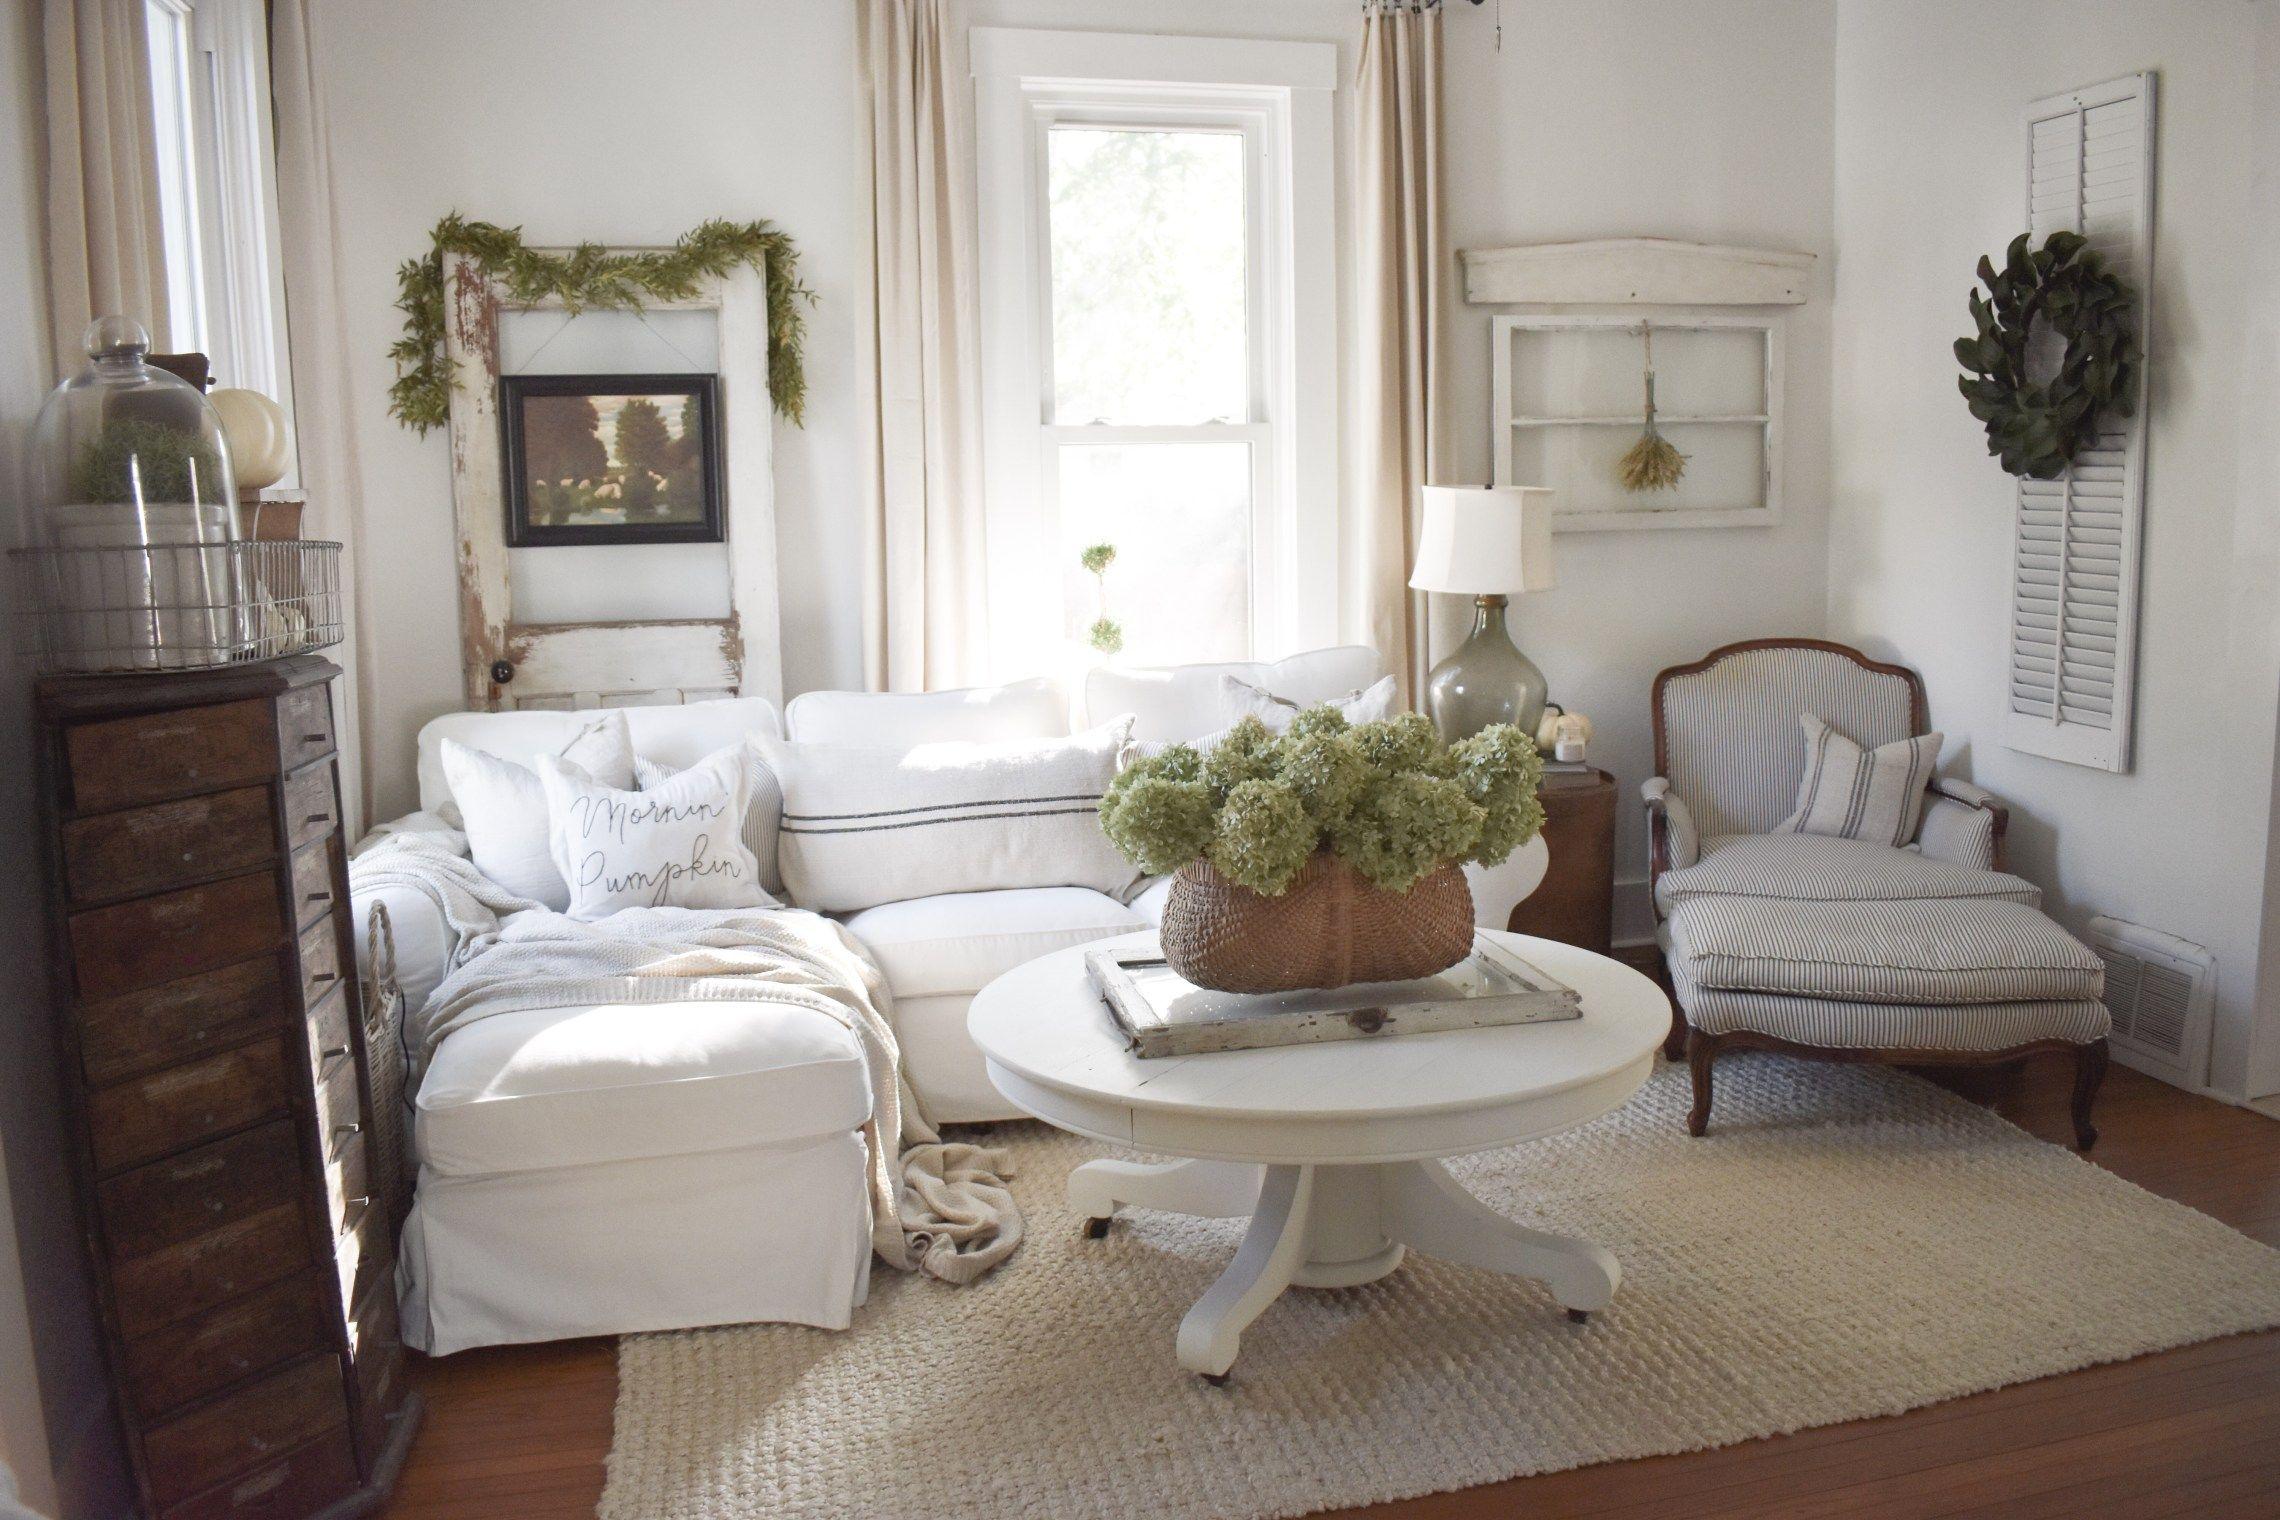 Ikea Ektorp Sofa Review Farm House Living Room